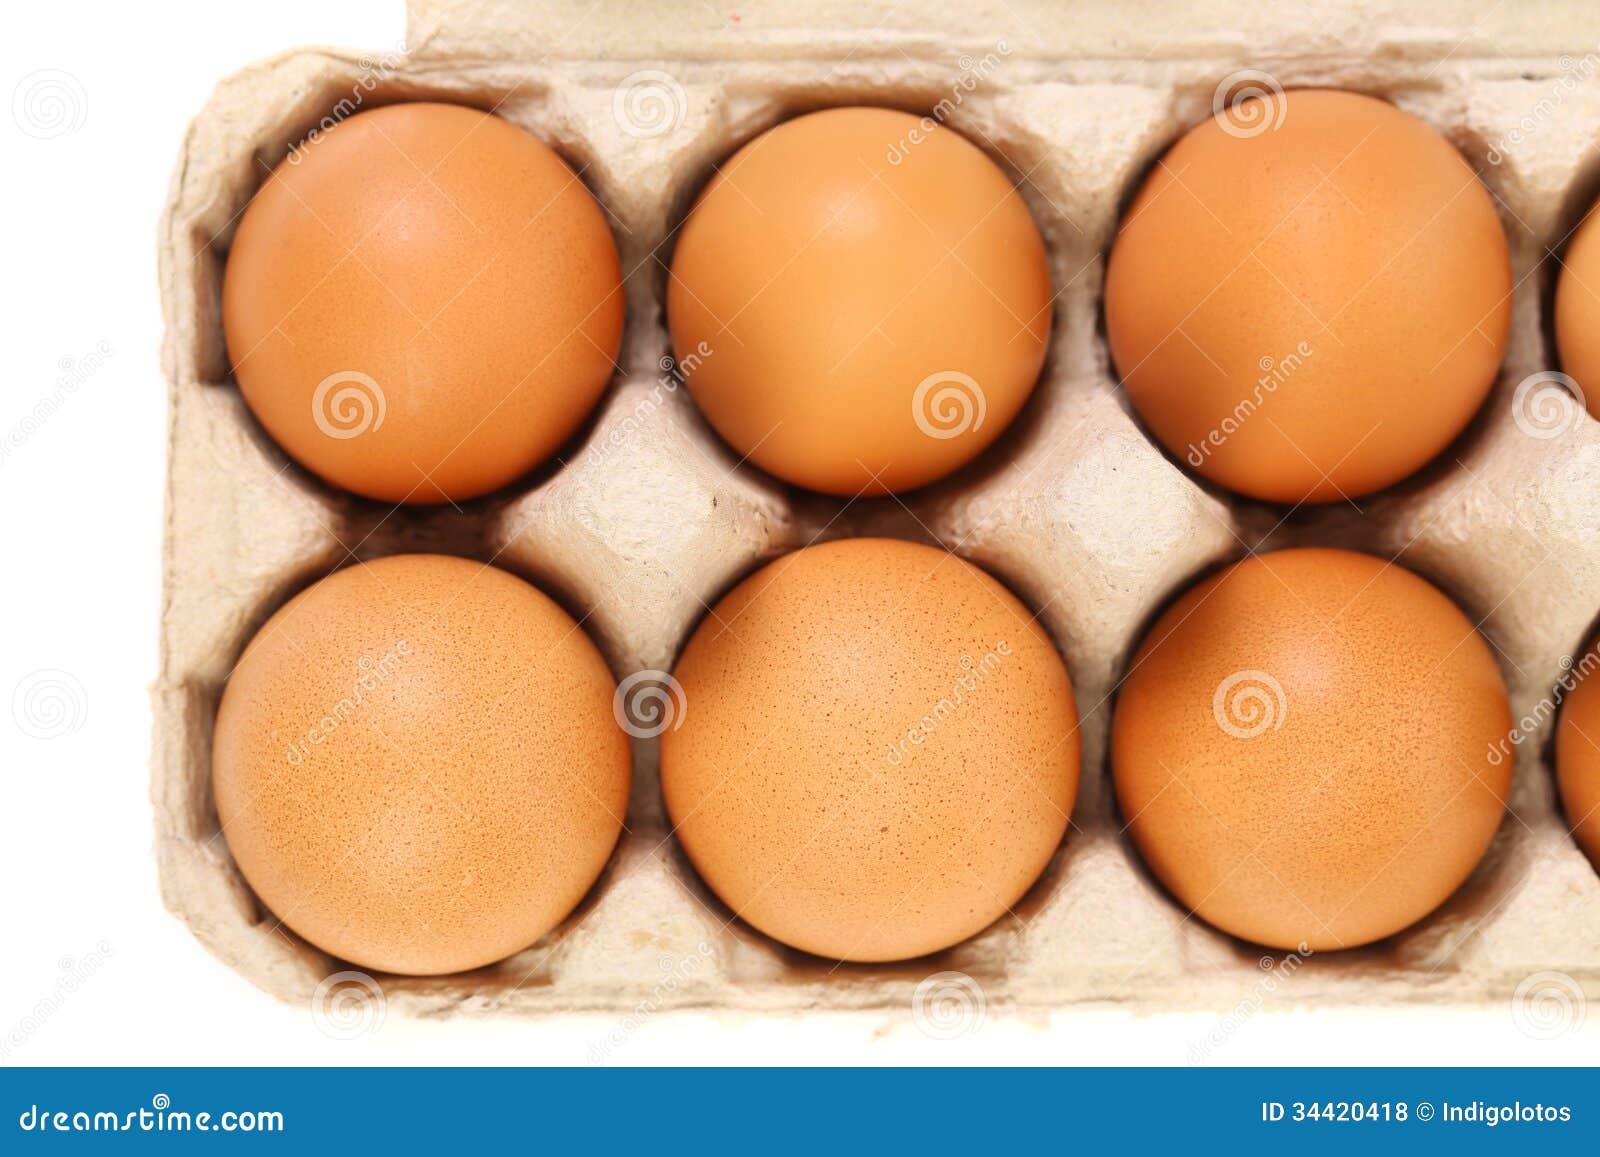 free raw egg display sex movies